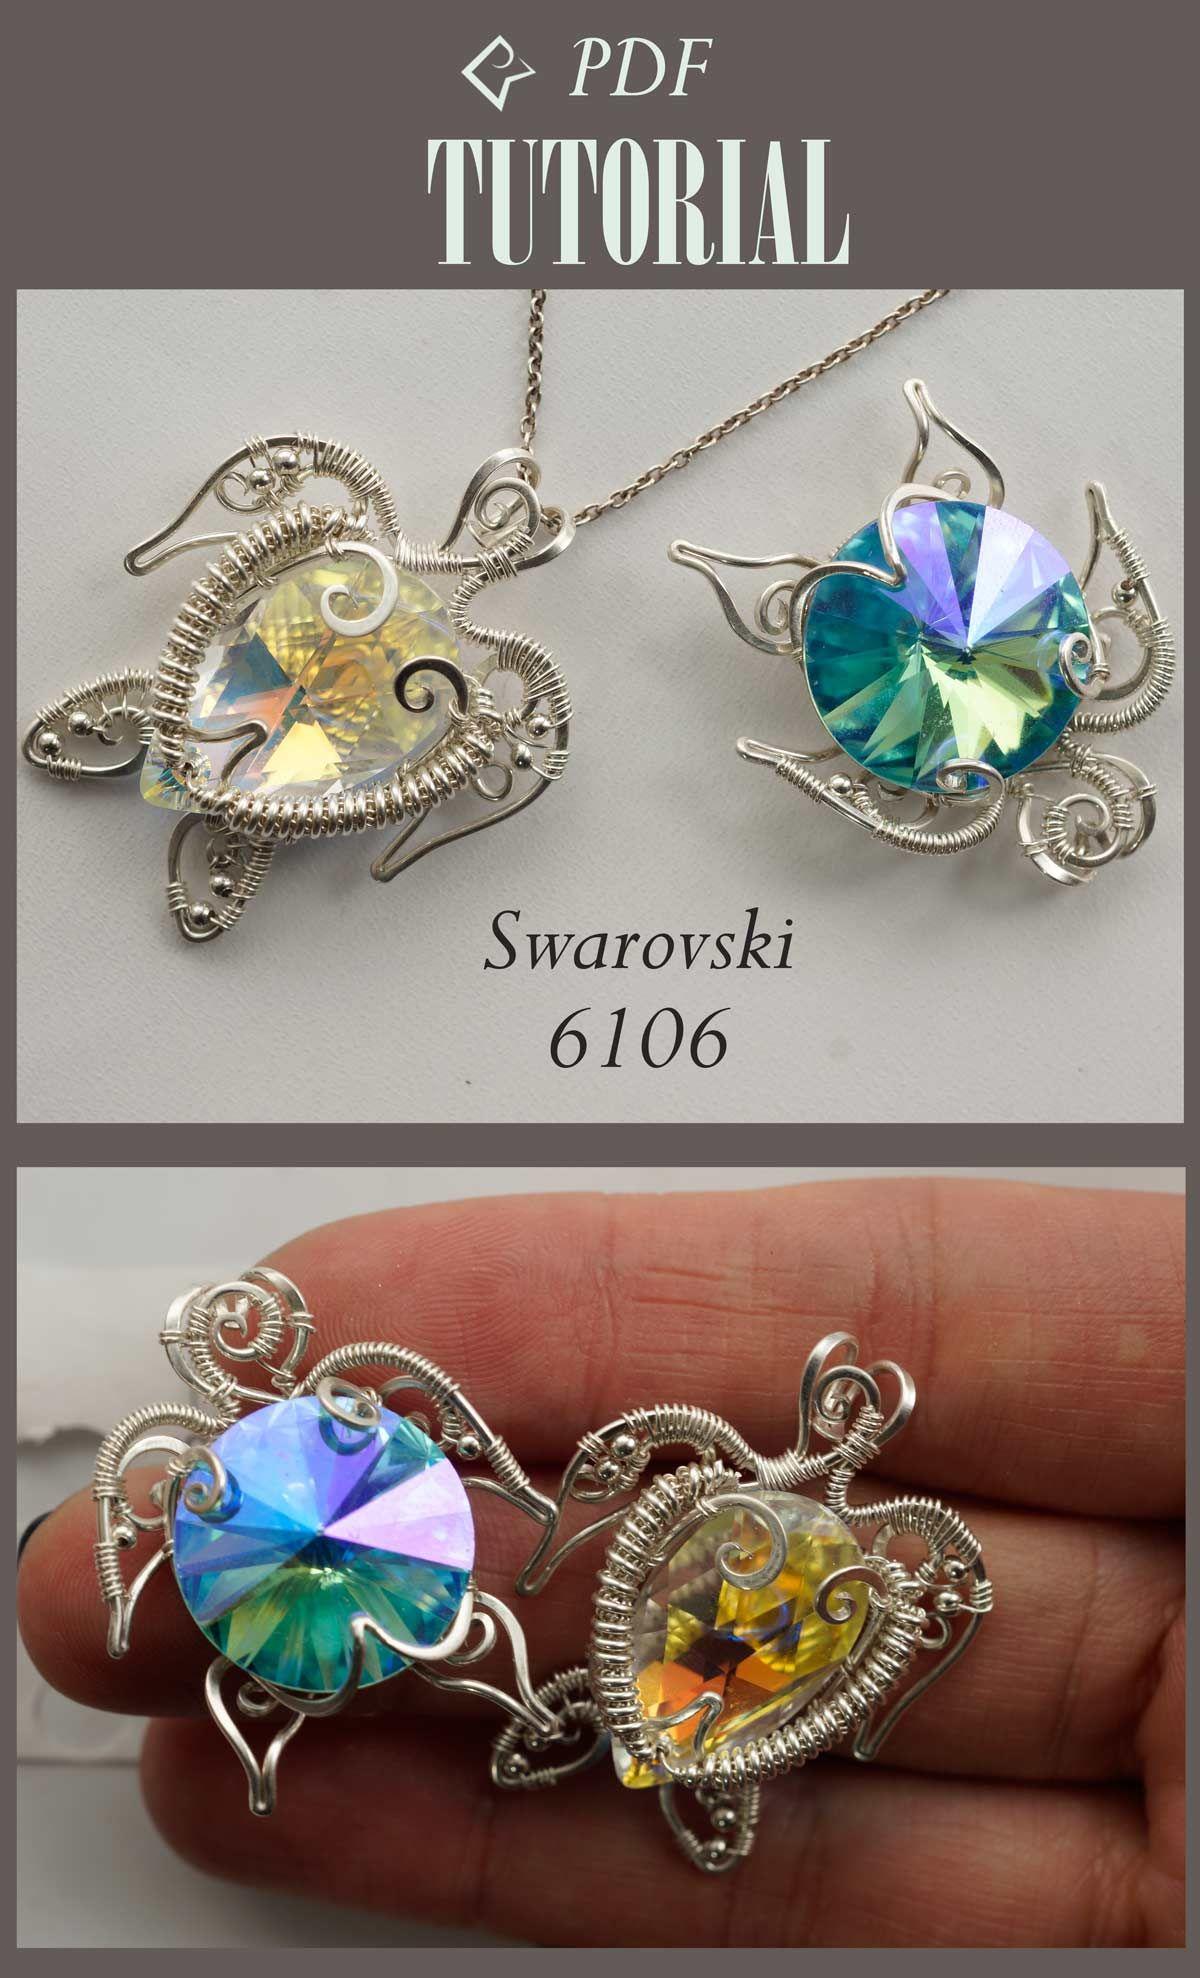 Speak English Quotes Cabochon Glass Necklace Silver fashion chain pendants